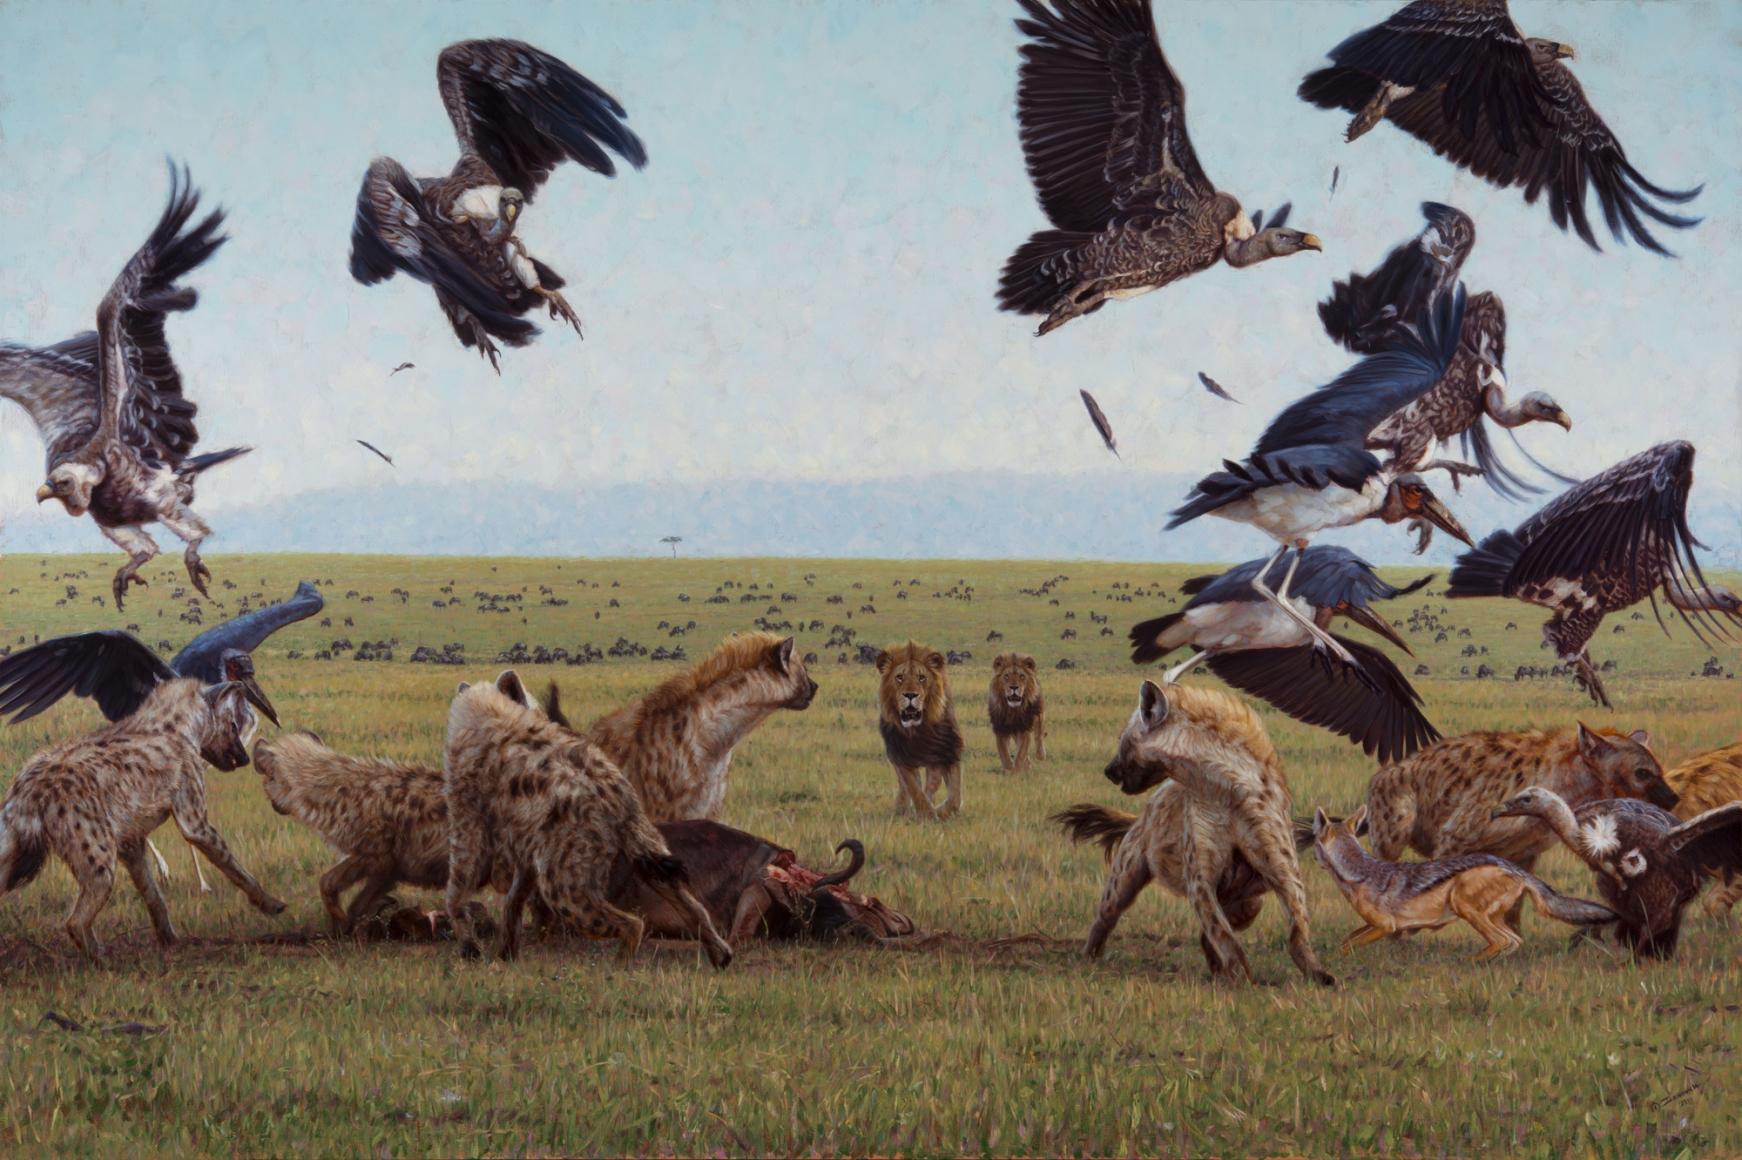 Game of Lions, 2014 - Works - Wildlife Art of John Banovich